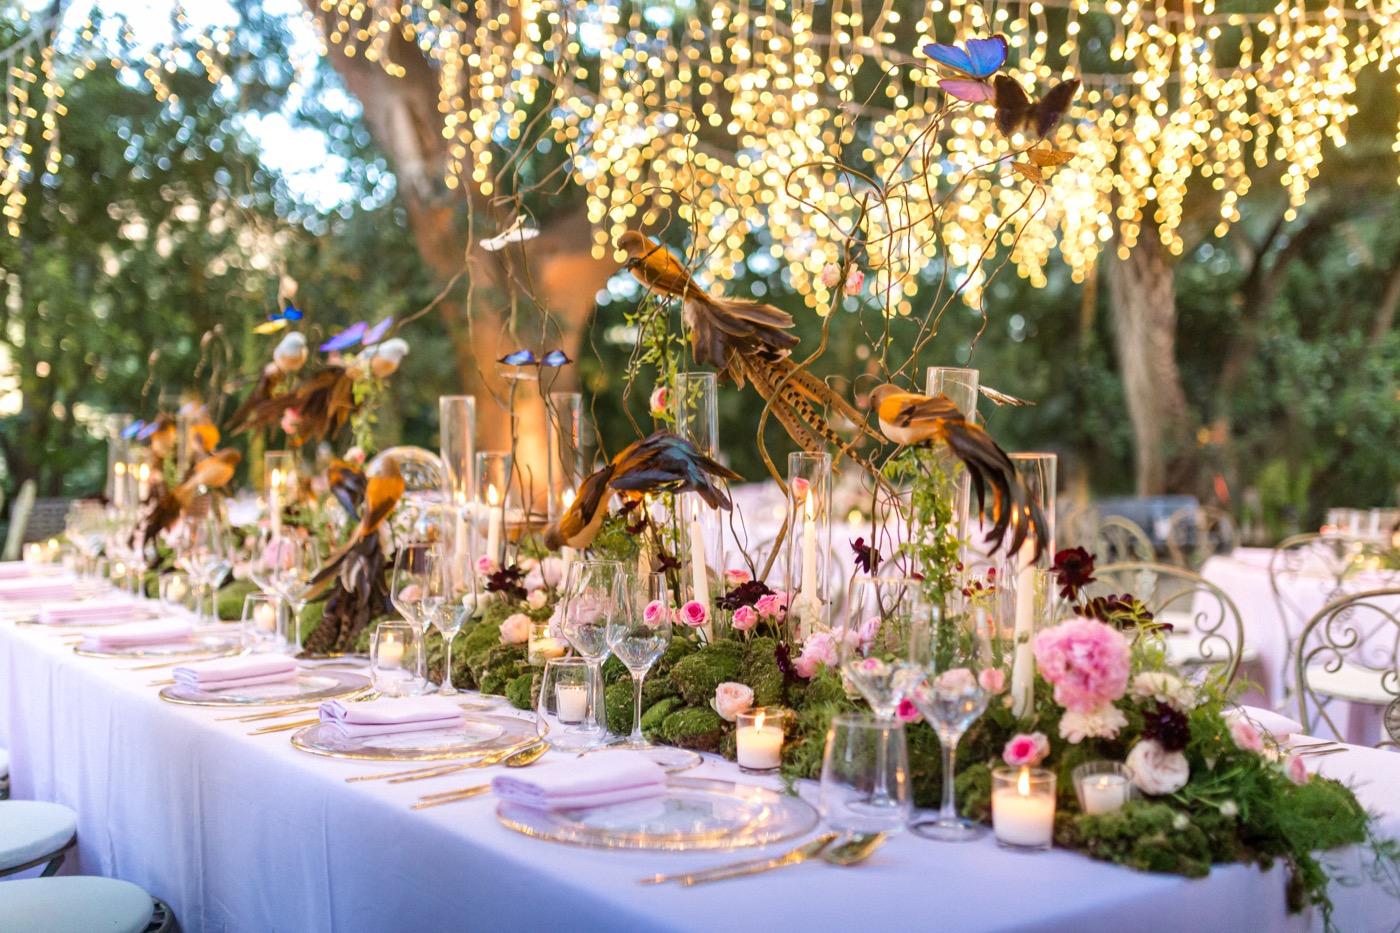 00107Luxury-Wedding-Planner-Spain- Sira-Antequera